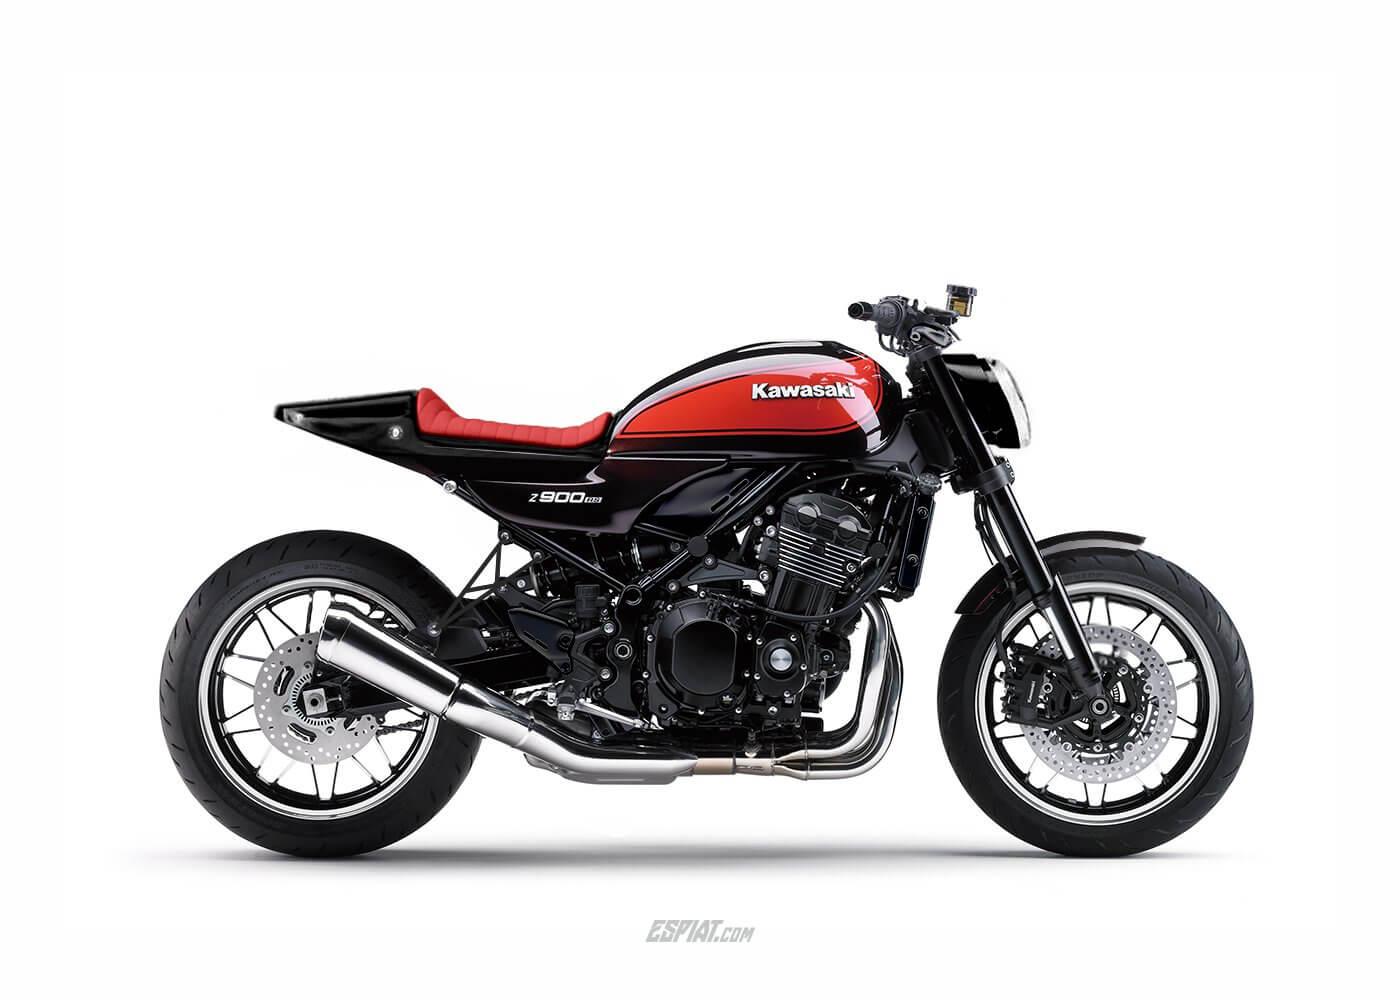 kawasaki-z900-rs-red-rs-cafe-racer-umbau-heck